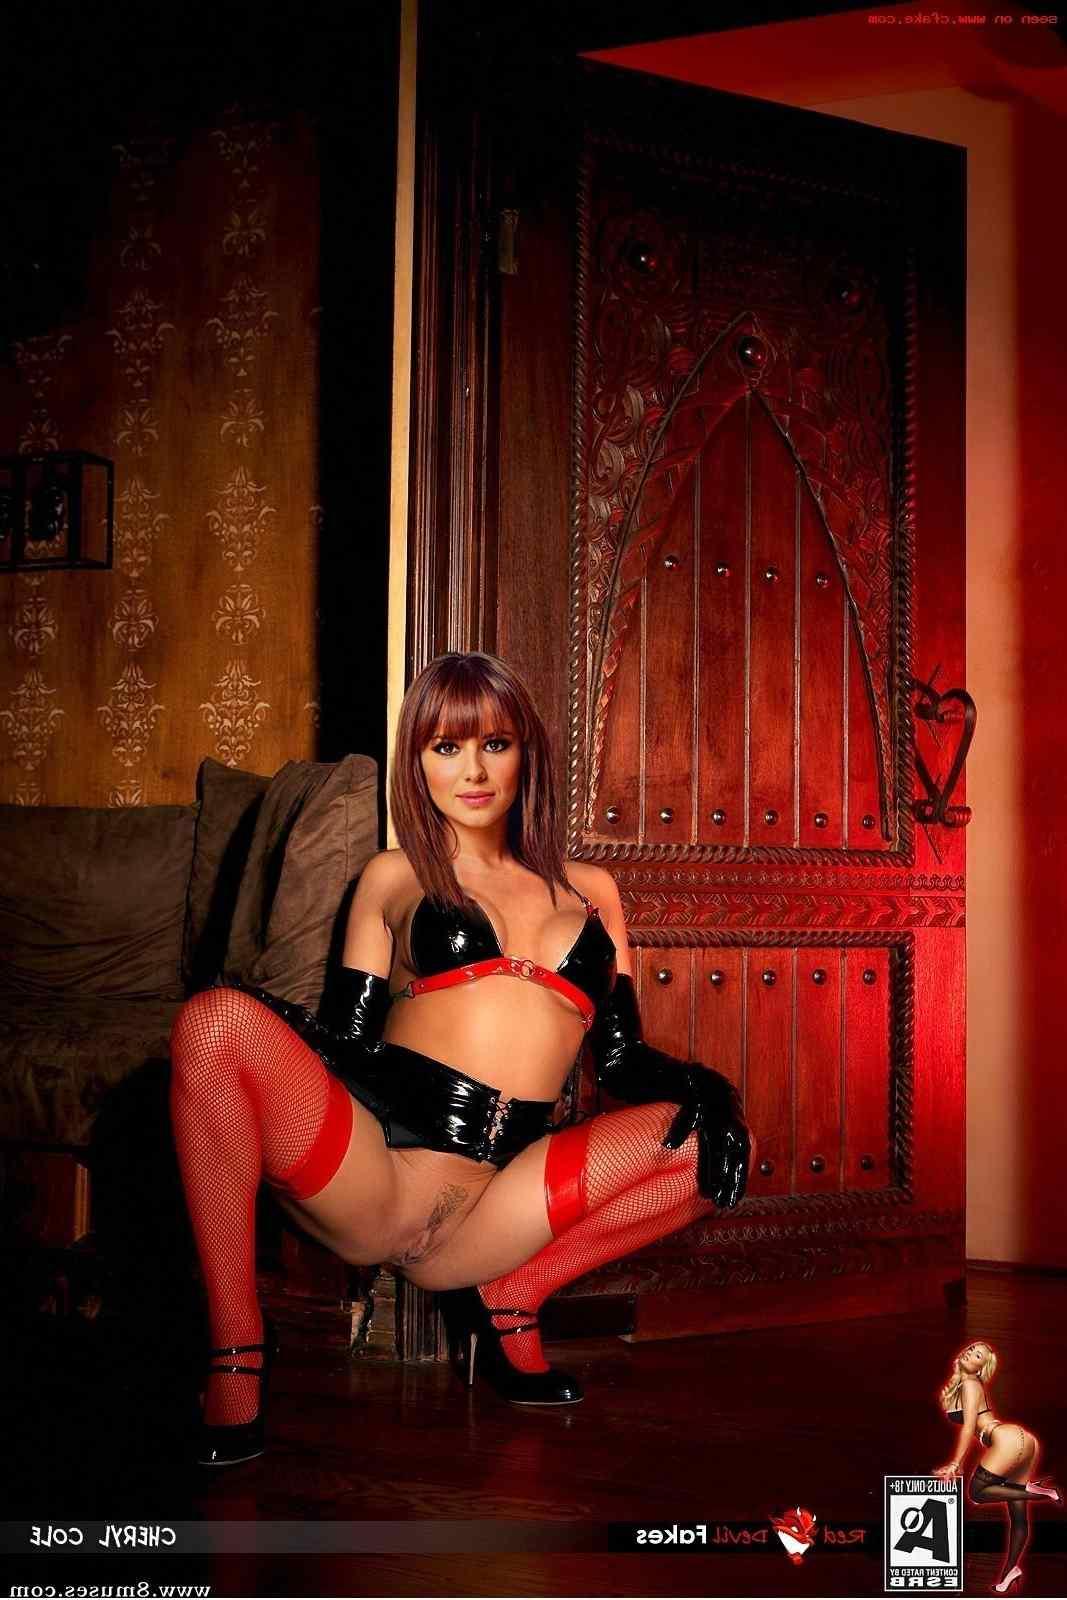 Fake-Celebrities-Sex-Pictures/Cheryl-Tweedy Cheryl__Tweedy__8muses_-_Sex_and_Porn_Comics_80.jpg